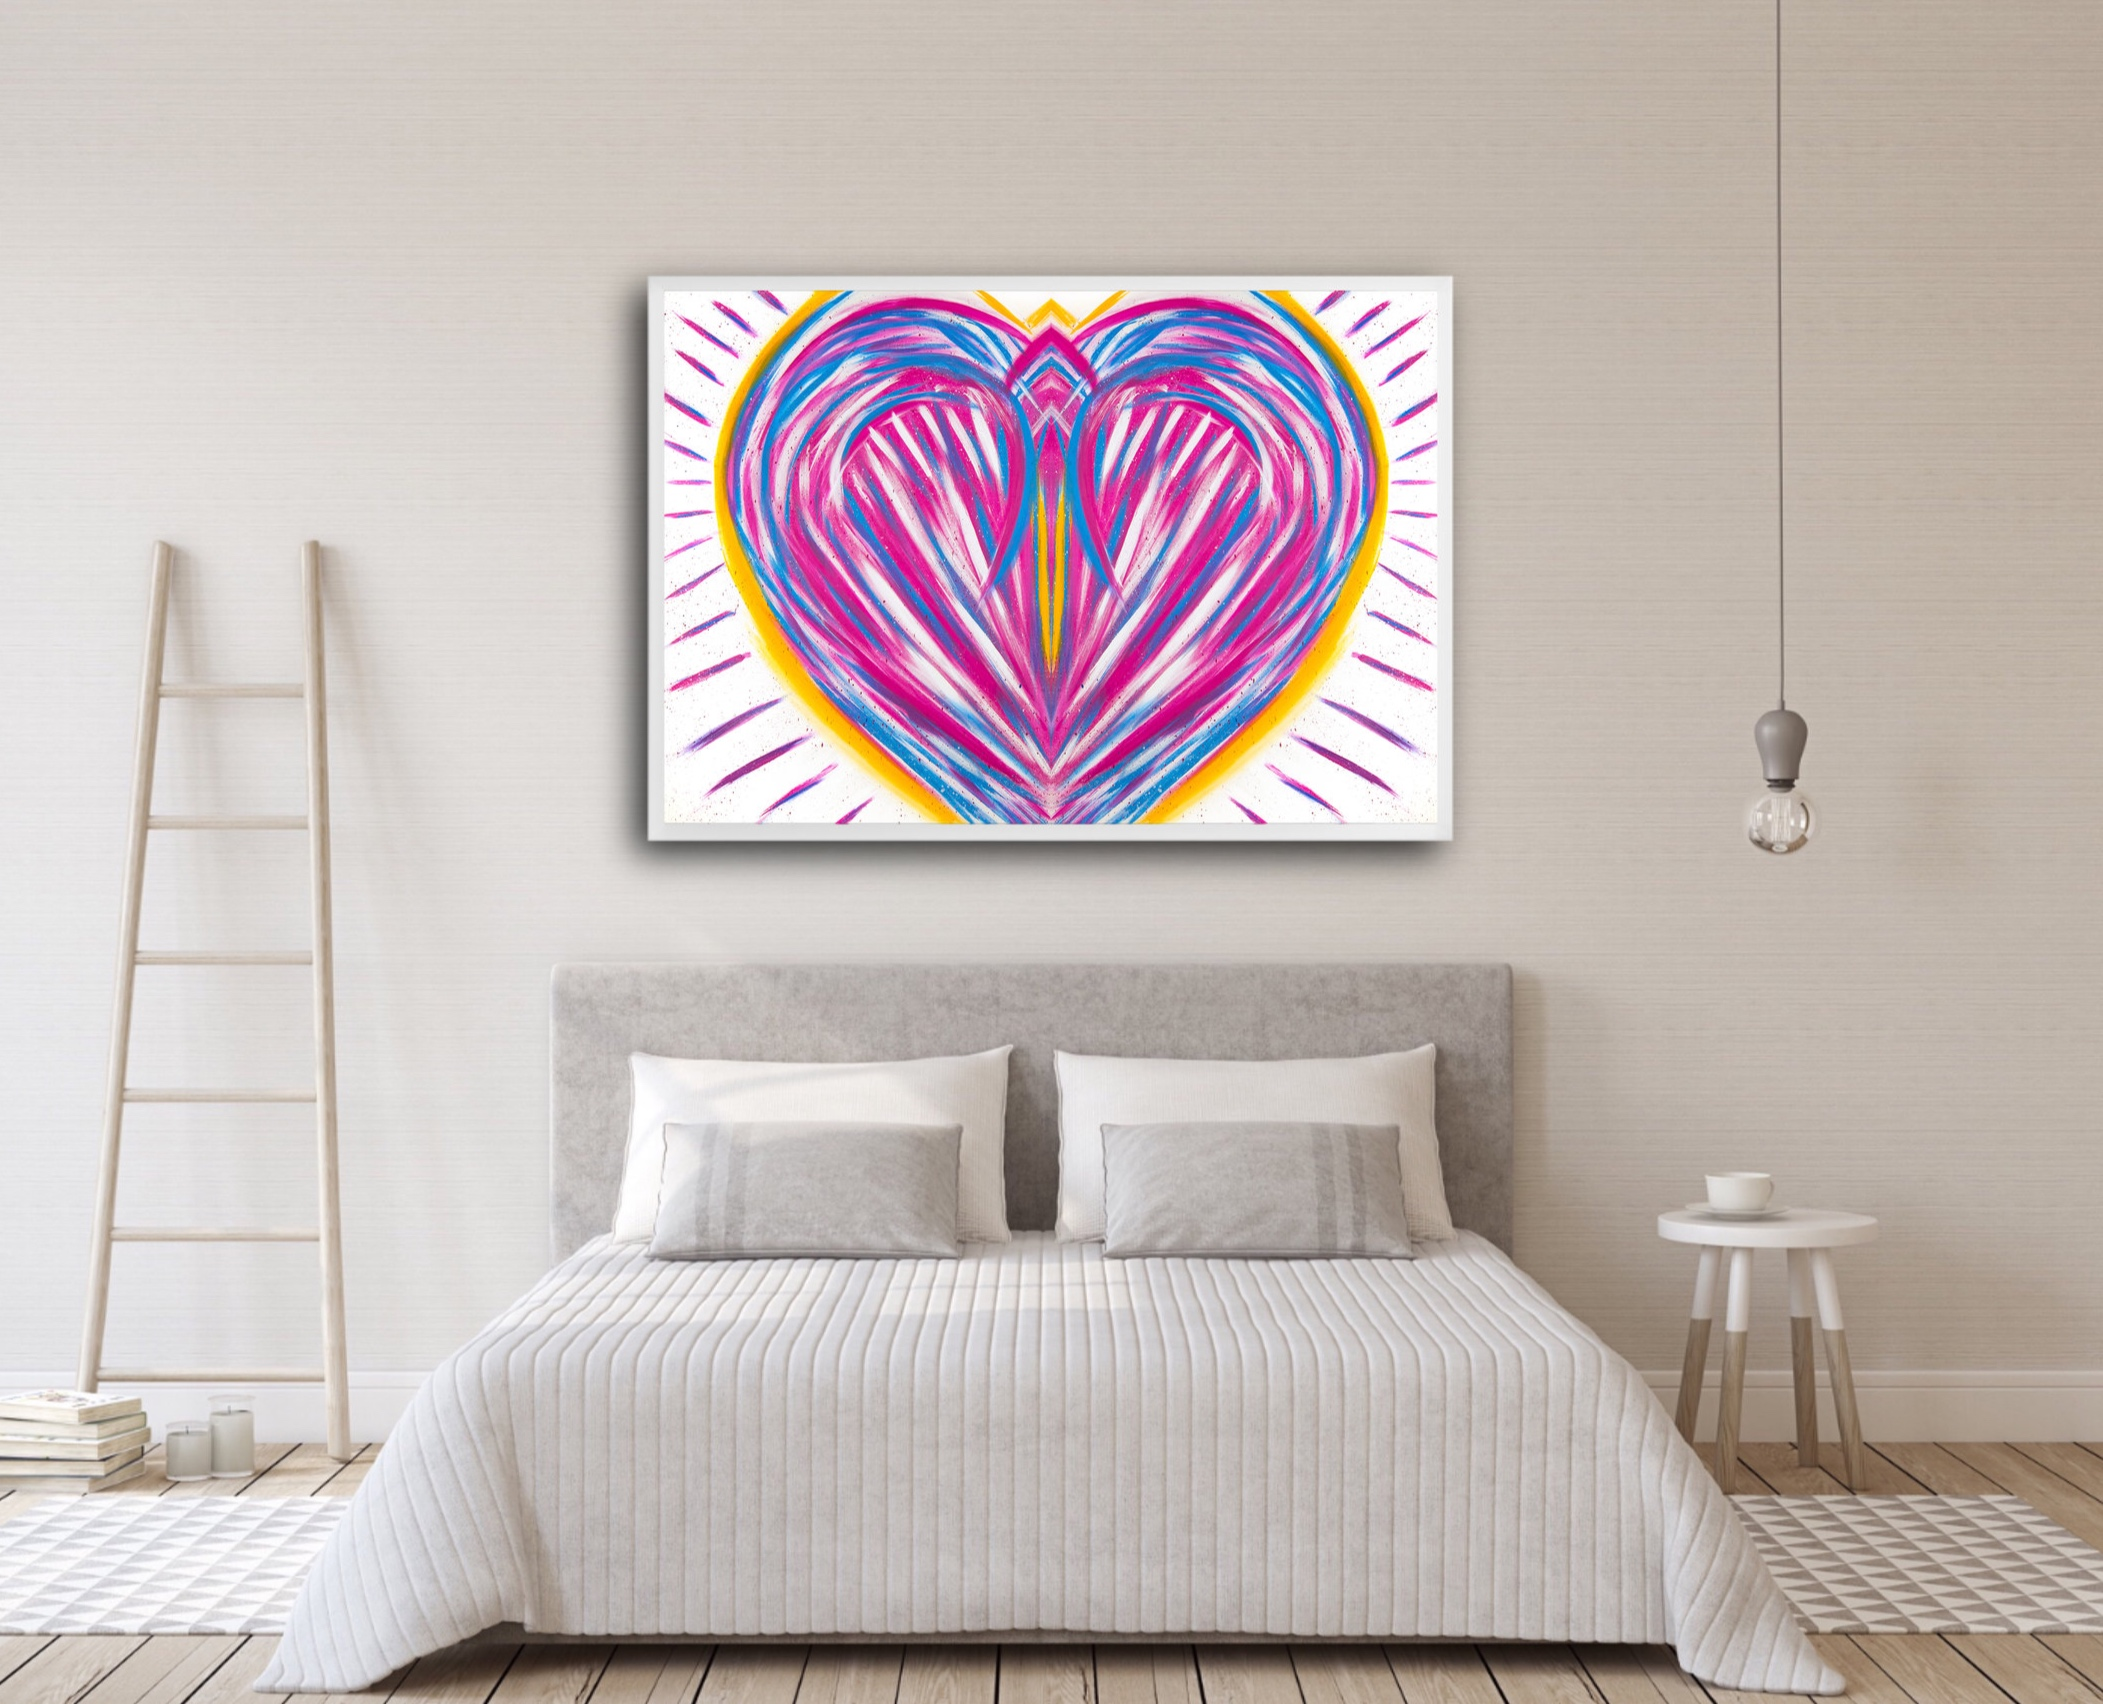 A HEALED HEART